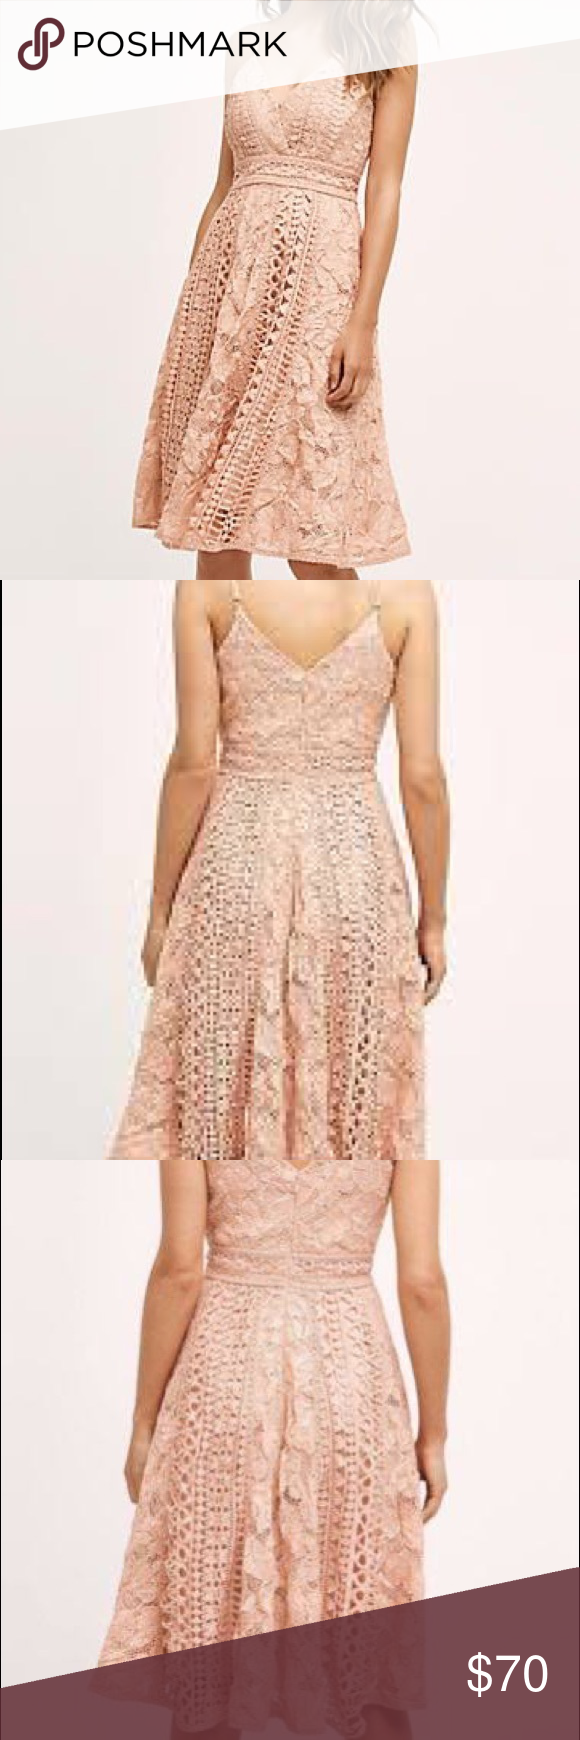 Anthropologie hd in paris astrid dress size p nwt